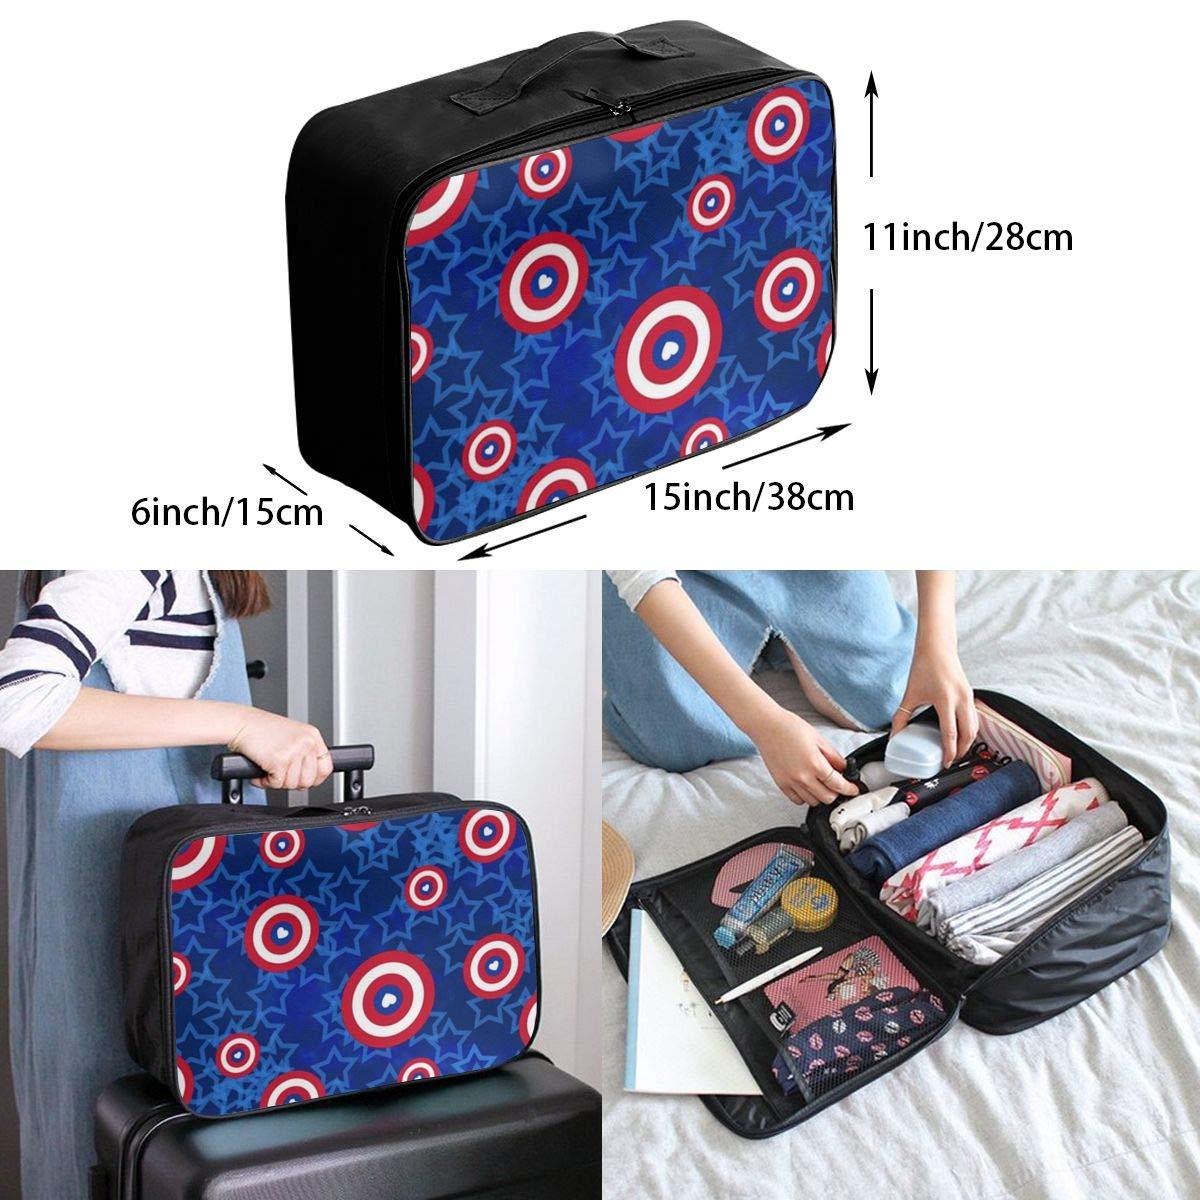 Travel Duffel Bag Waterproof Fashion Lightweight Large Capacity Portable Luggage Bag USA American Flag Stars Love Heart Blue